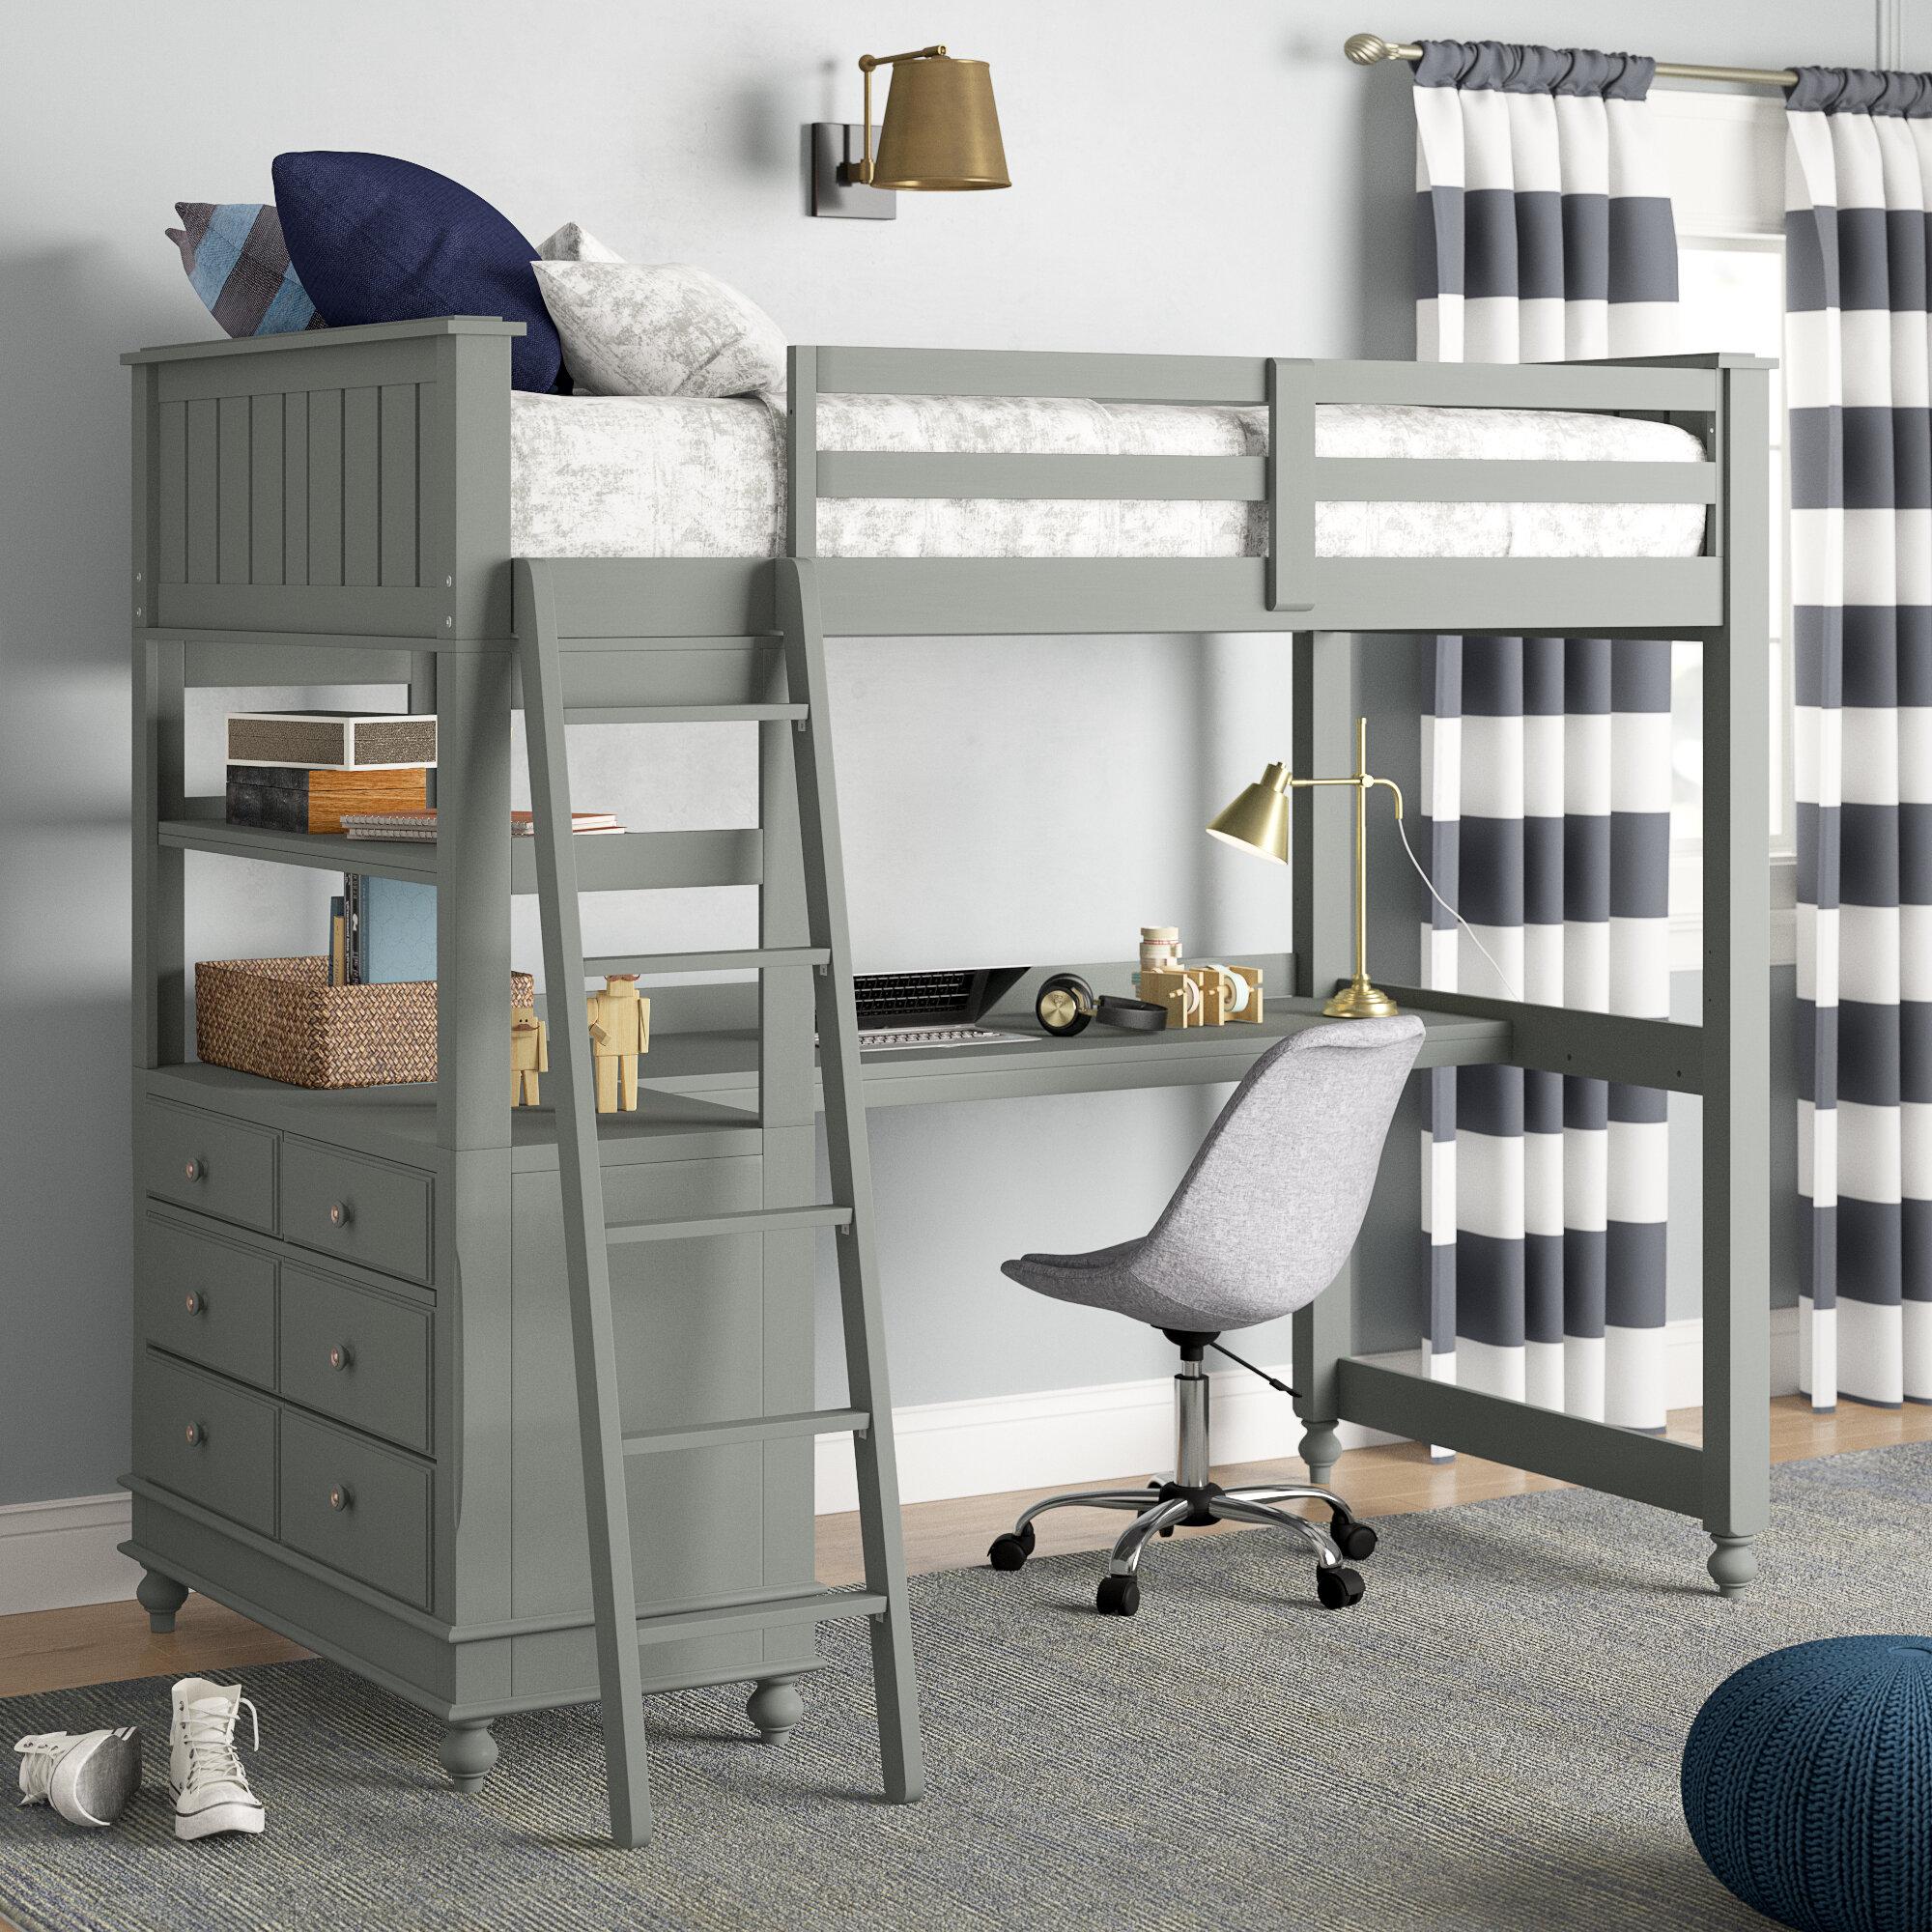 Wayfair.com & Desk Full Loft Beds You\u0027ll Love in 2019 | Wayfair